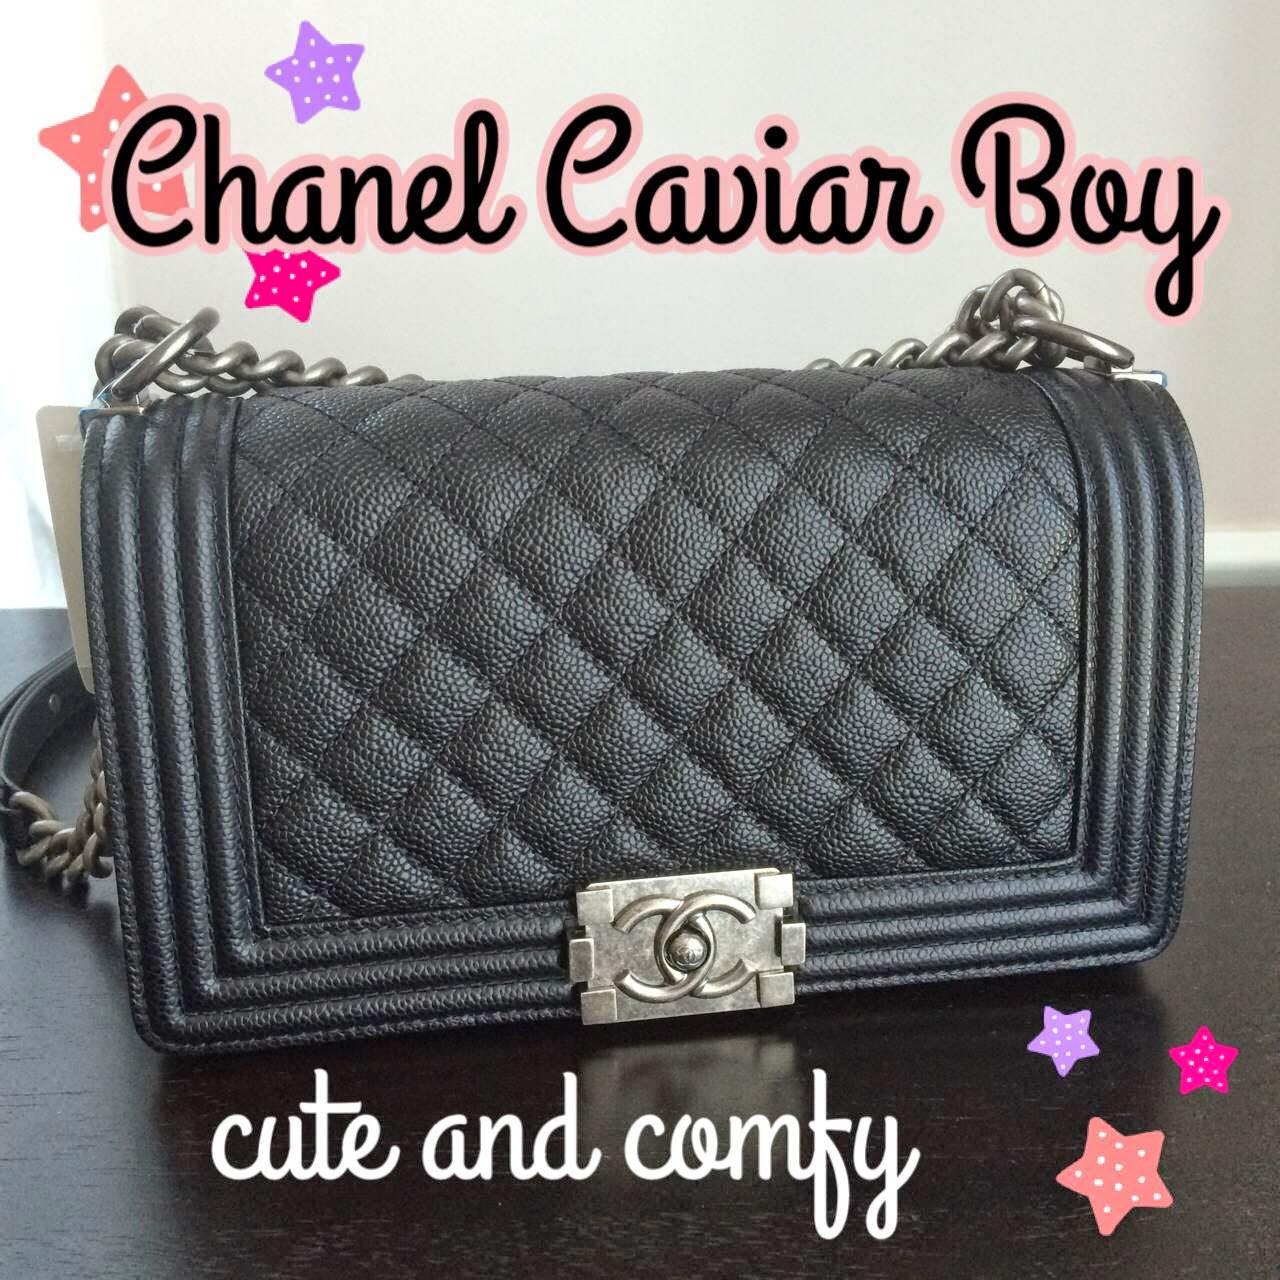 b0e900b3a2a7 cute and comfy  Chanel Old Medium Quilted Caviar Boy Bag 14B